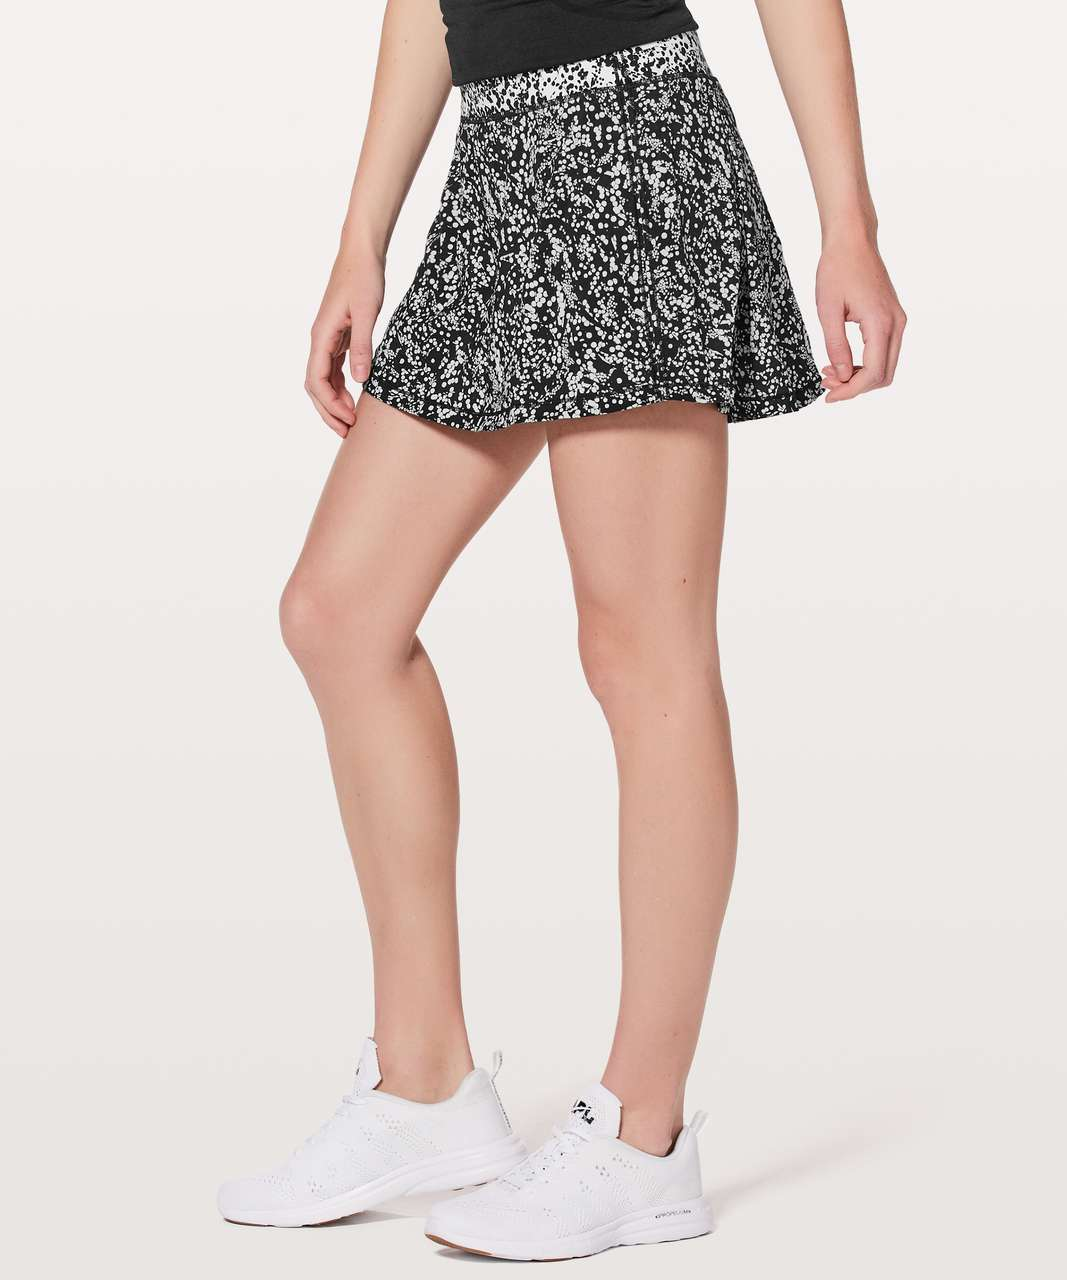 Lululemon Pace Rival Skirt (Tall) *No Panels - Chirasu Black / Chirakasu Alpine White